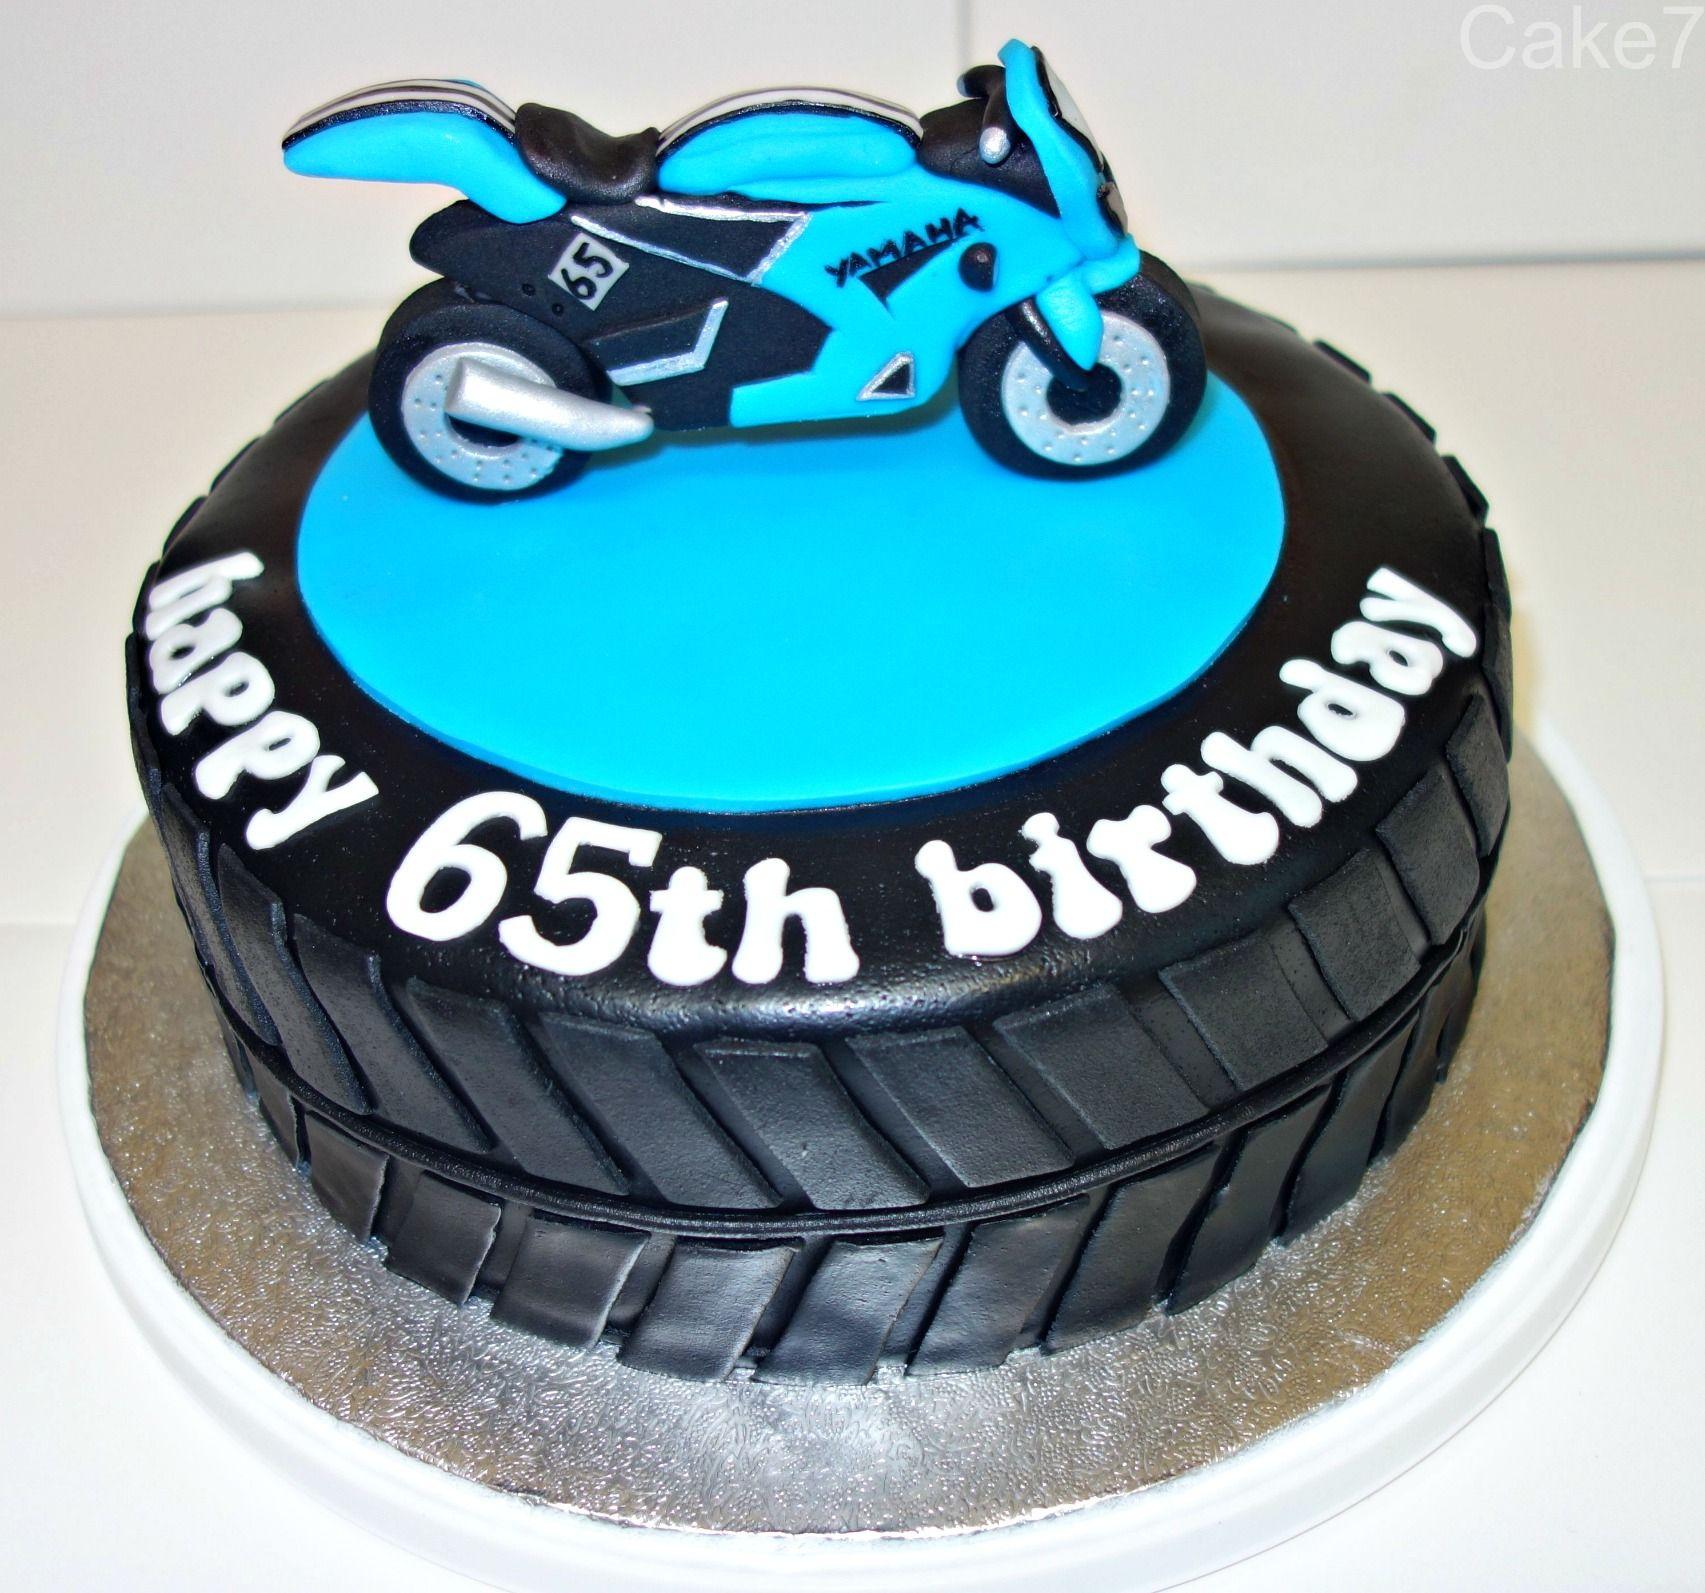 'Superbike' themed cake. www.cakeseven.wix... Facebook- Cake7. Twitter- Cake7 email: cake.seven@aol.co.uk phone: 07731 882 988